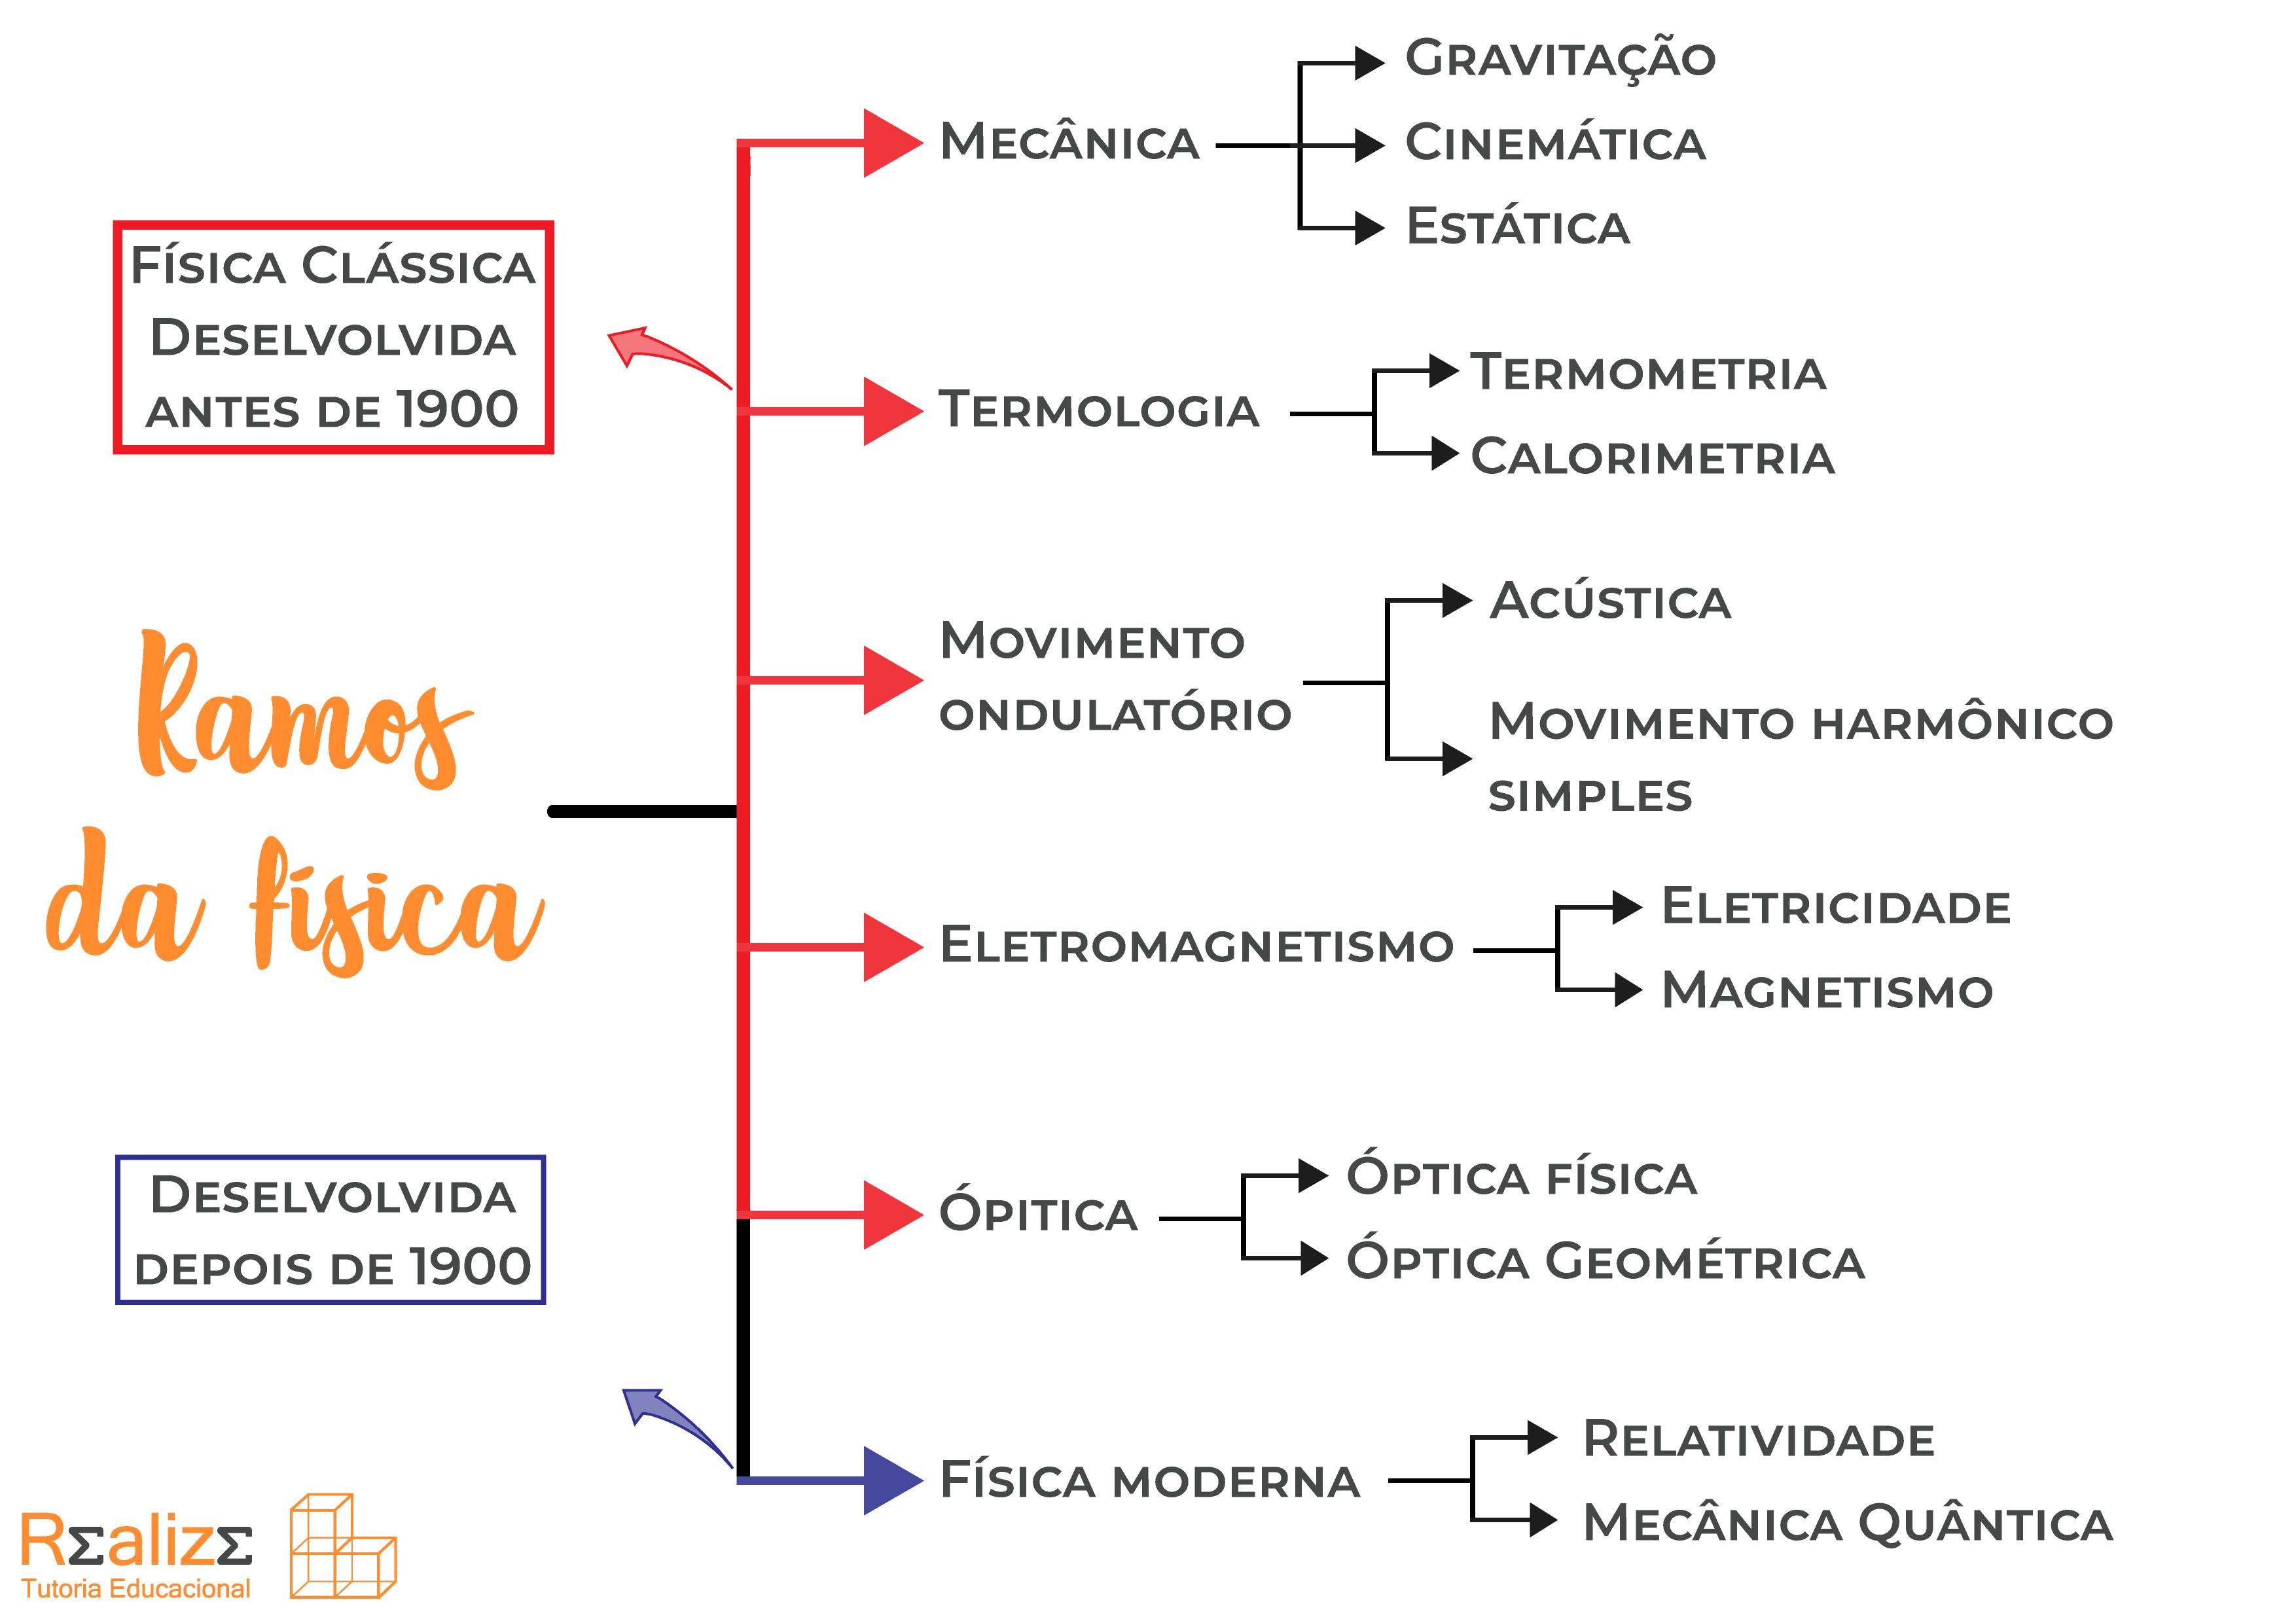 Mapa mental - Ramos da física